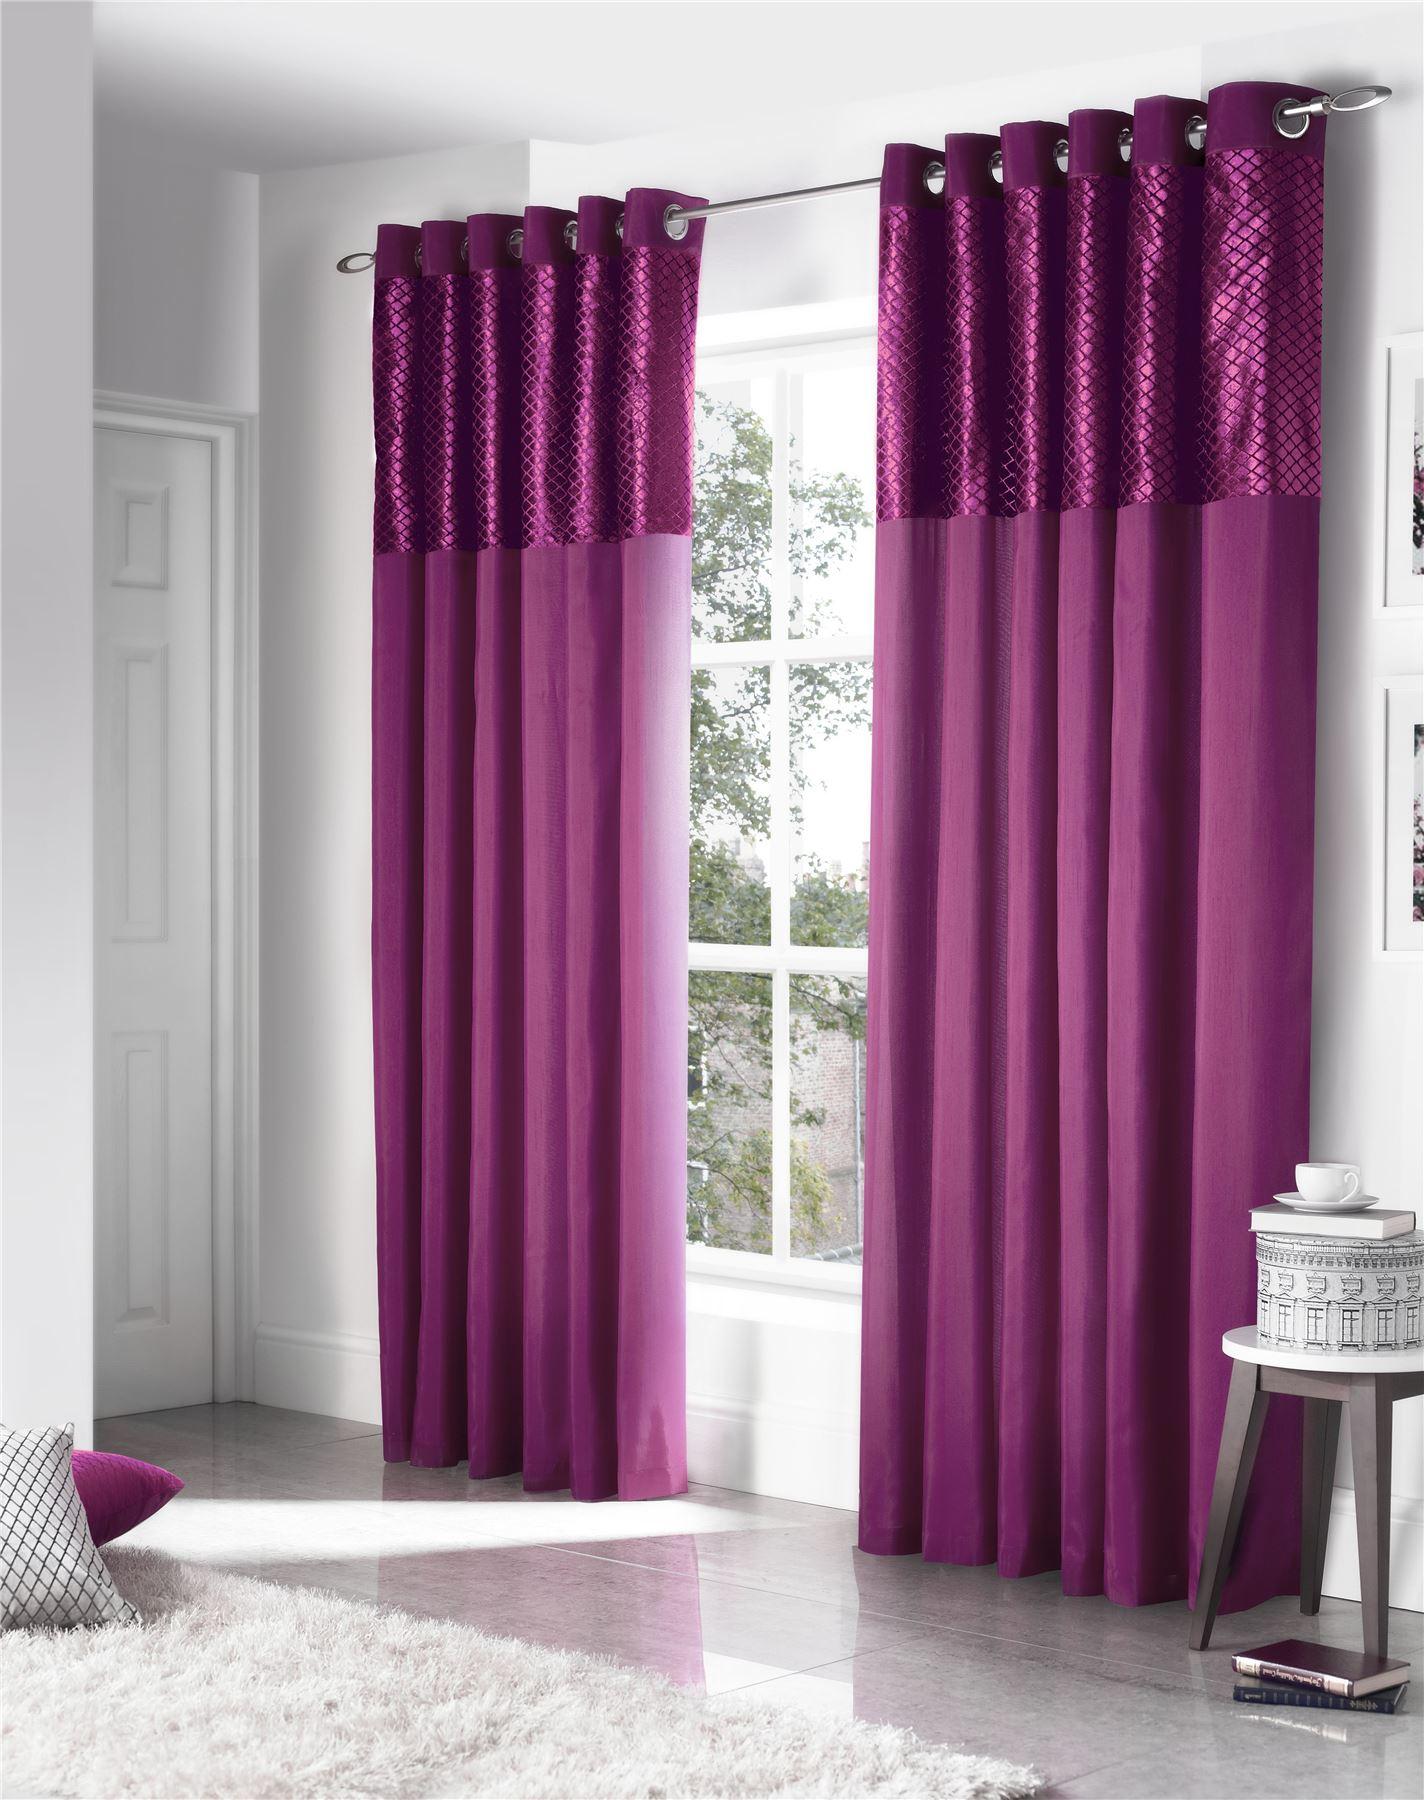 Faux Silk Cut Velvet Purple Lined Ring Top Curtains Drapes 5 Sizes Ebay